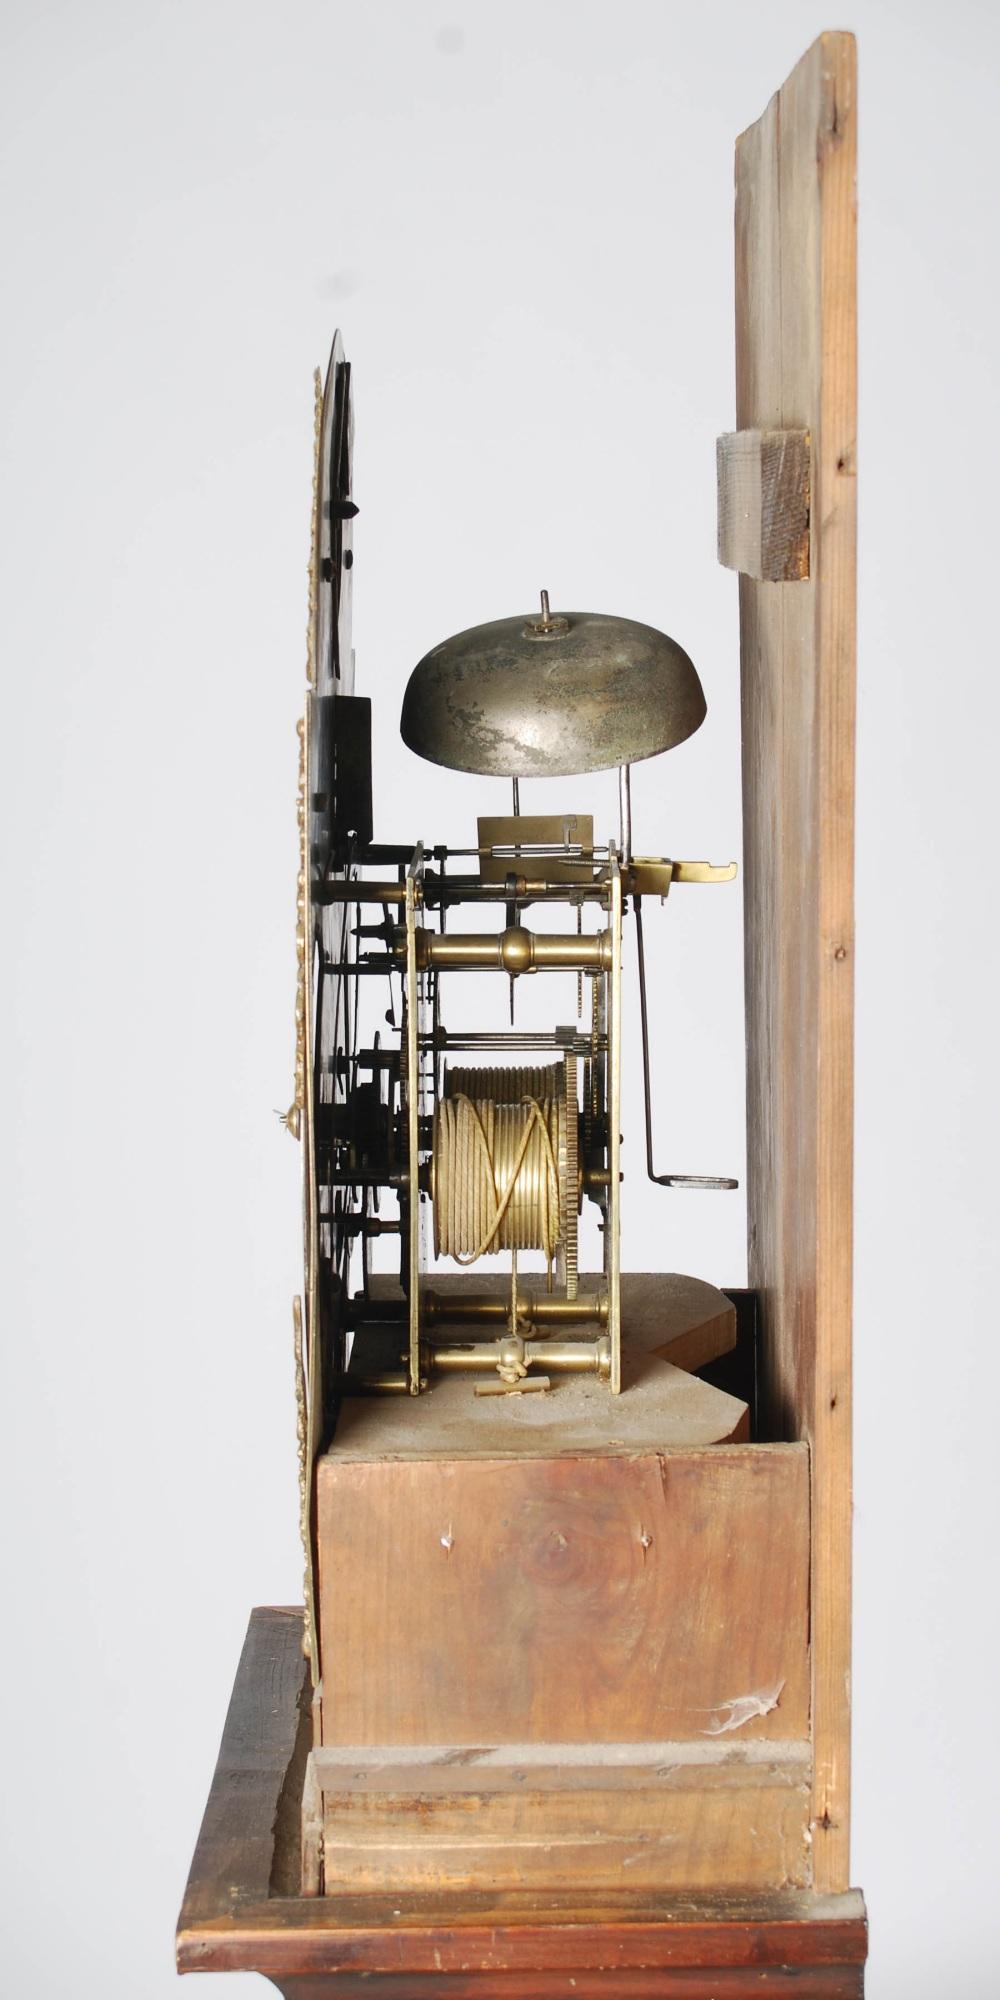 Lot 5 - A George III mahogany longcase clock, Alexr. Ferguson, Coupar of Fife, the brass dial with silver